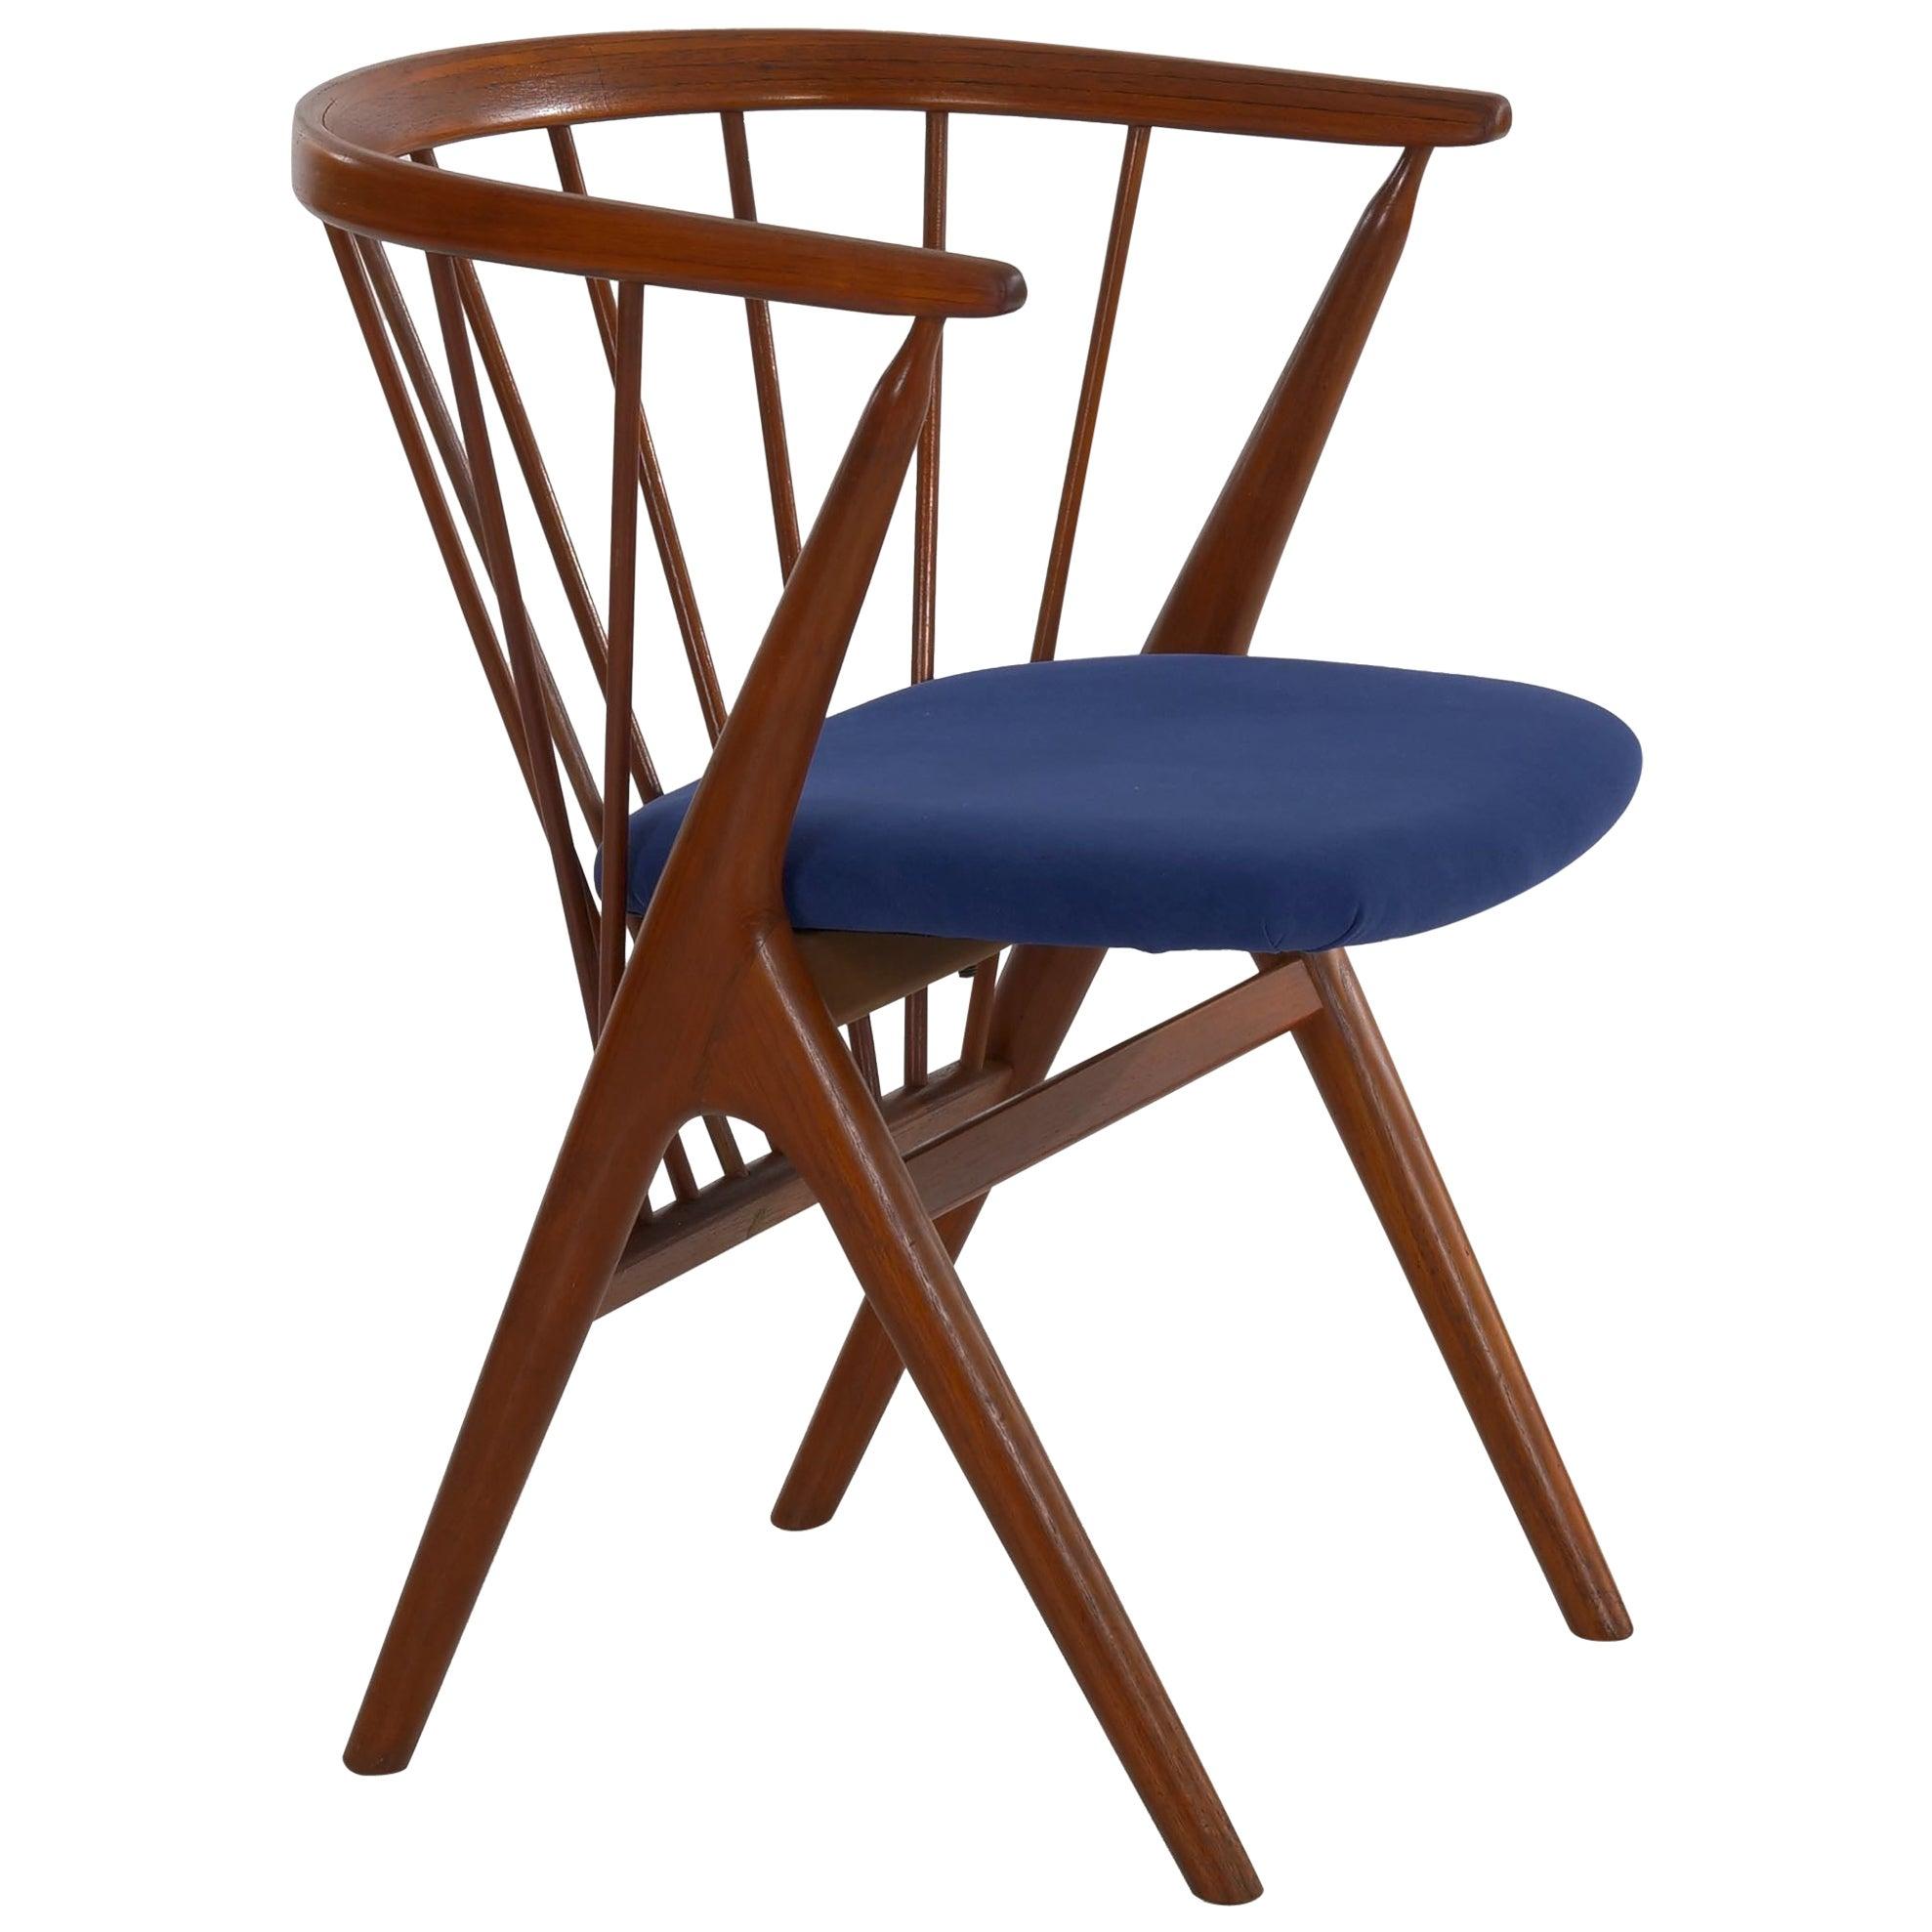 "Helge Sibast ""No. 8"" Danish Mid-Century Modern Spindle Back Armchair"